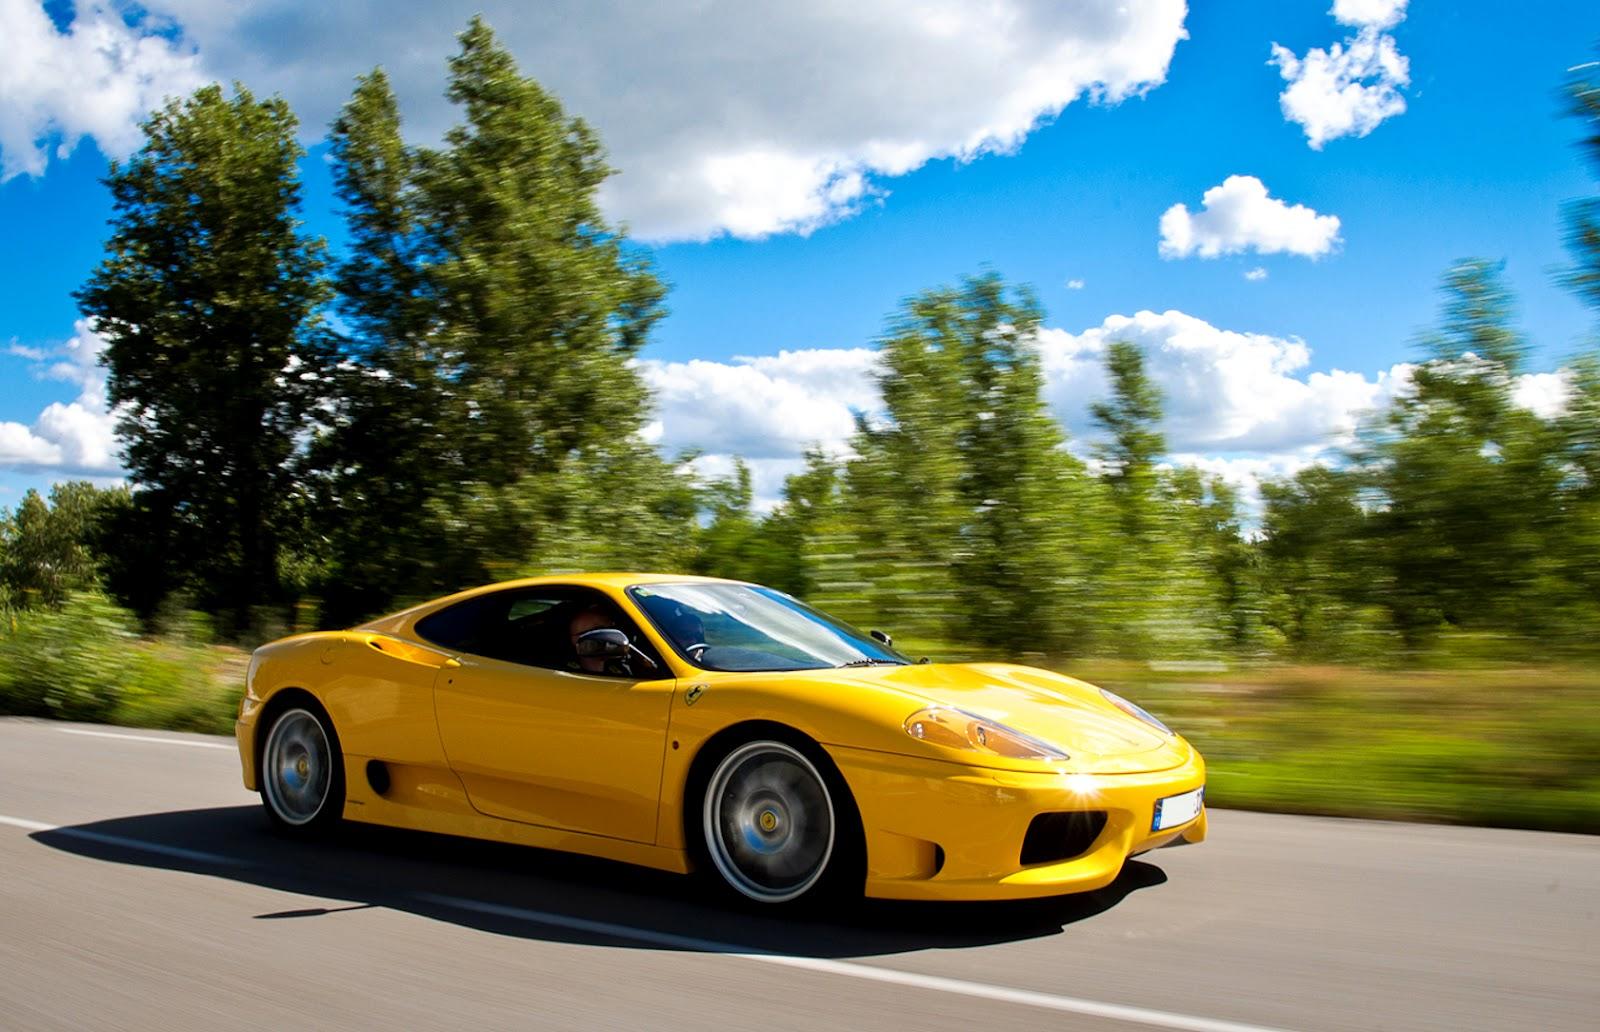 Cute Cute Babies Hd Wallpapers Top 50 Most Dashing And Beautiful Ferrari Car Wallpapers In Hd